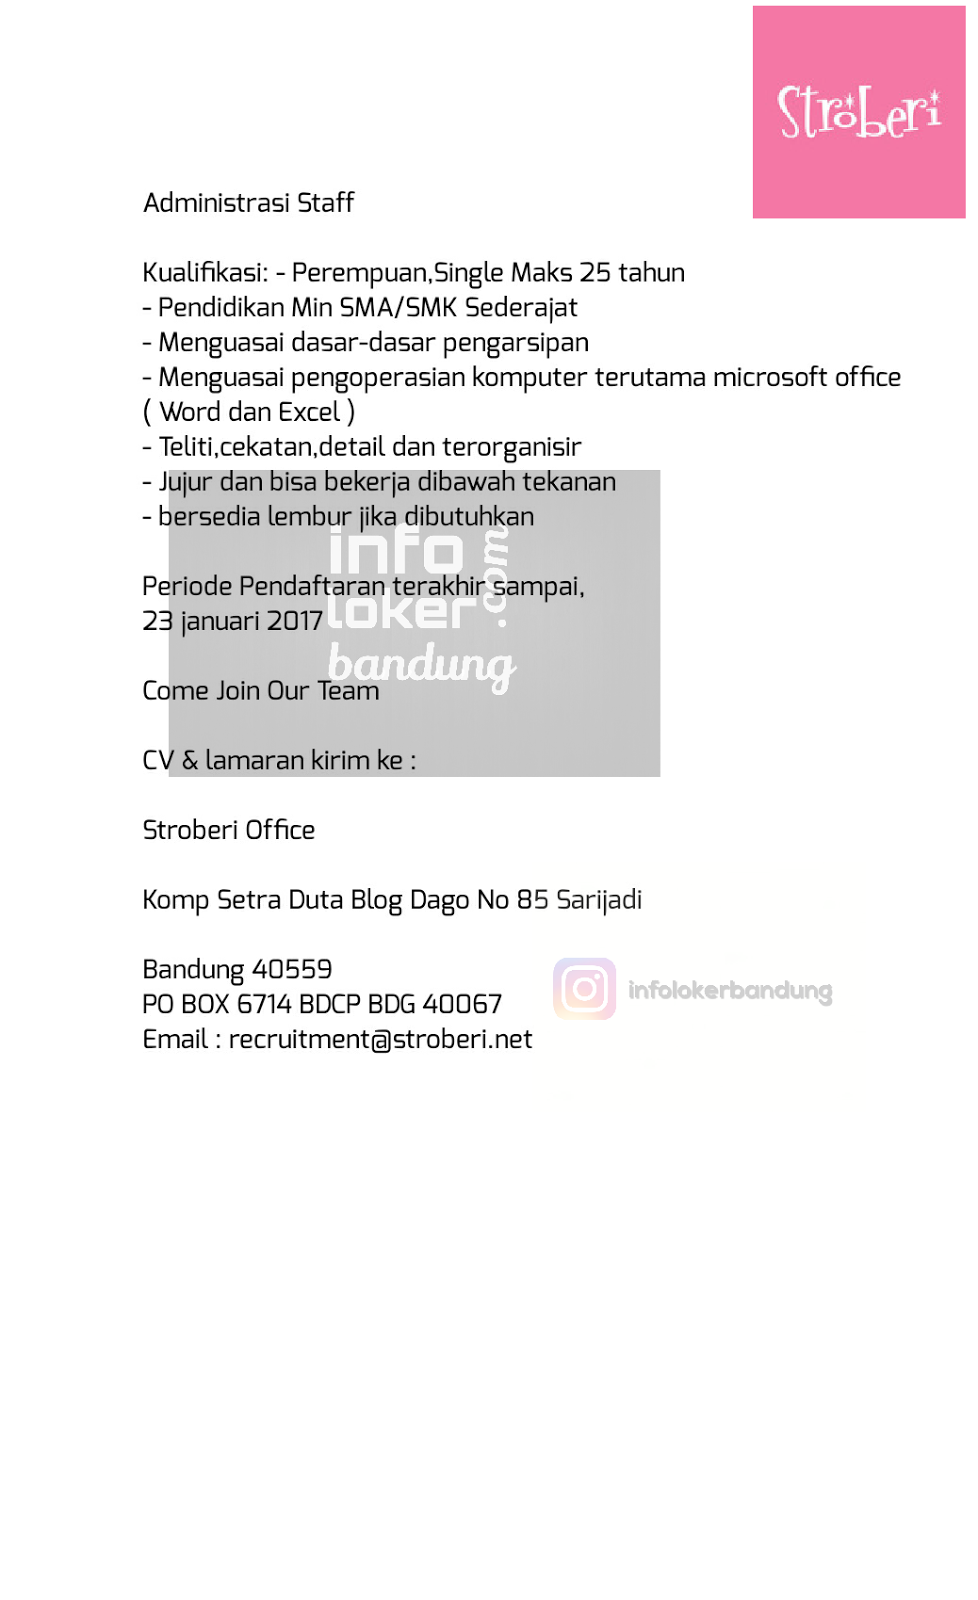 Lowongan Kerja Stroberi Bandung Januari 2017